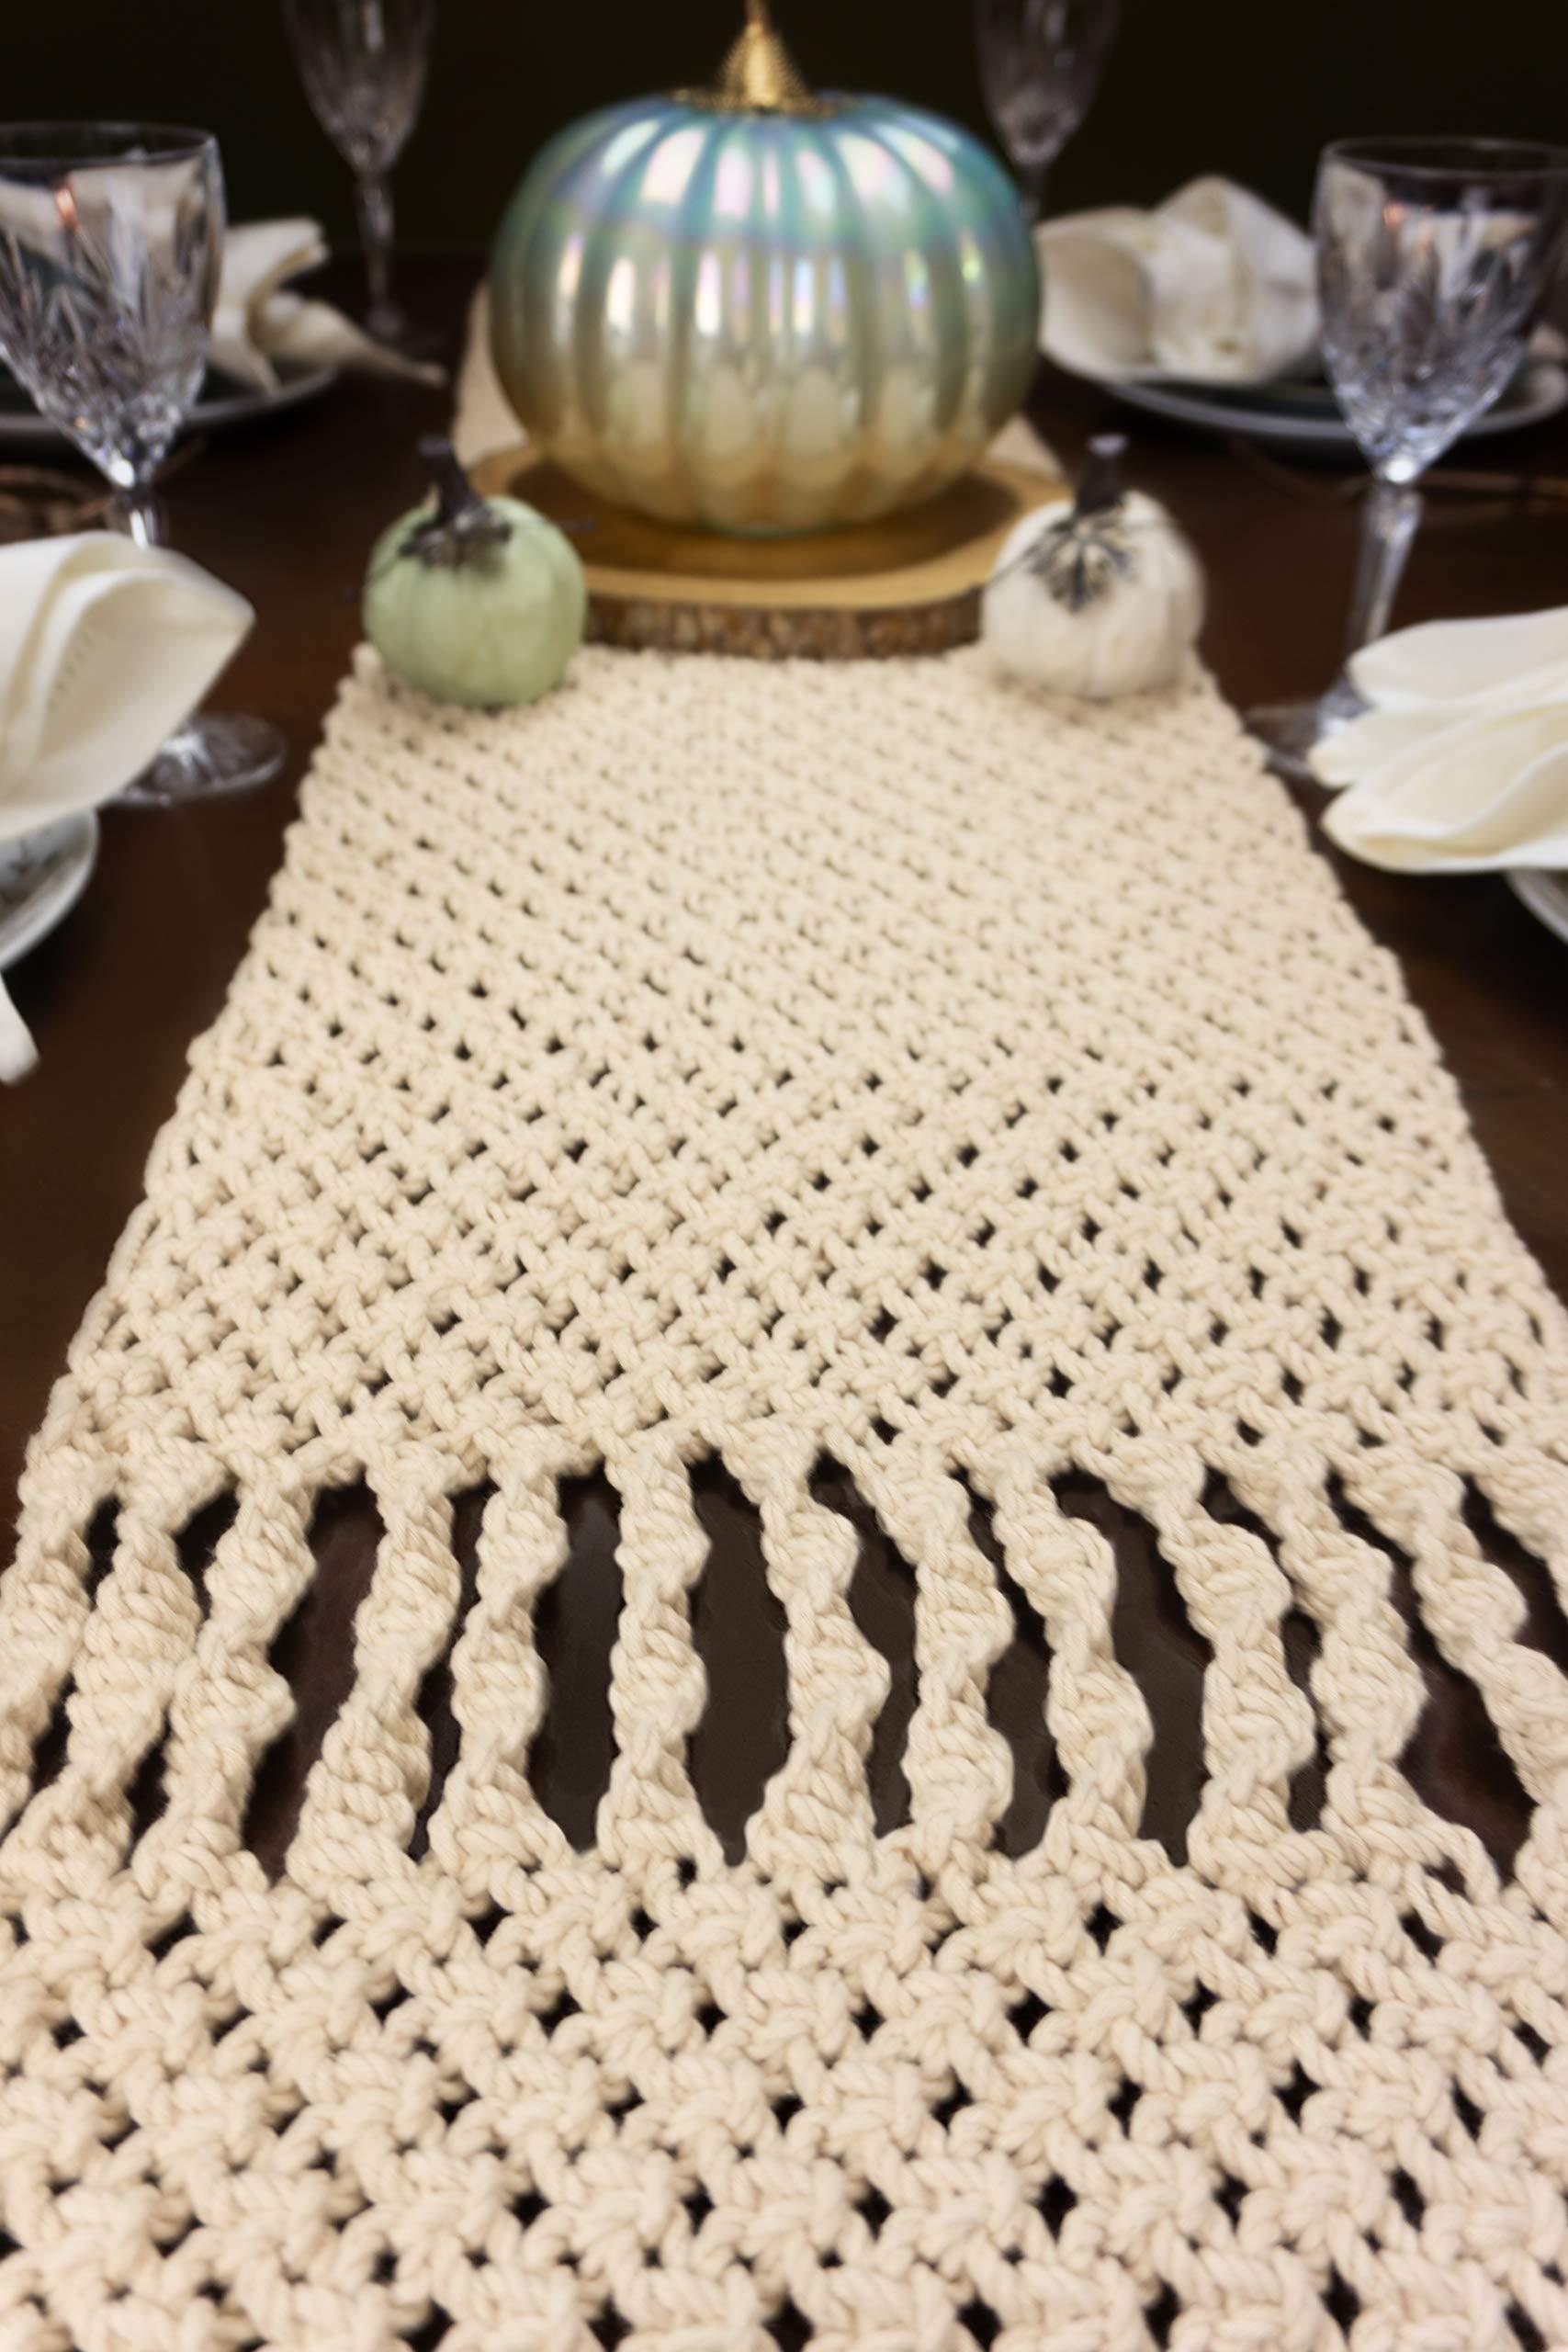 Aura Design's Macrame Table Runner - 96 x 14 Inch Cotton Handwoven Boho Wedding Table Decor Farmhouse and Bohemian Dining Room Kitchen Decor, Dresser Decor by Aura Design's